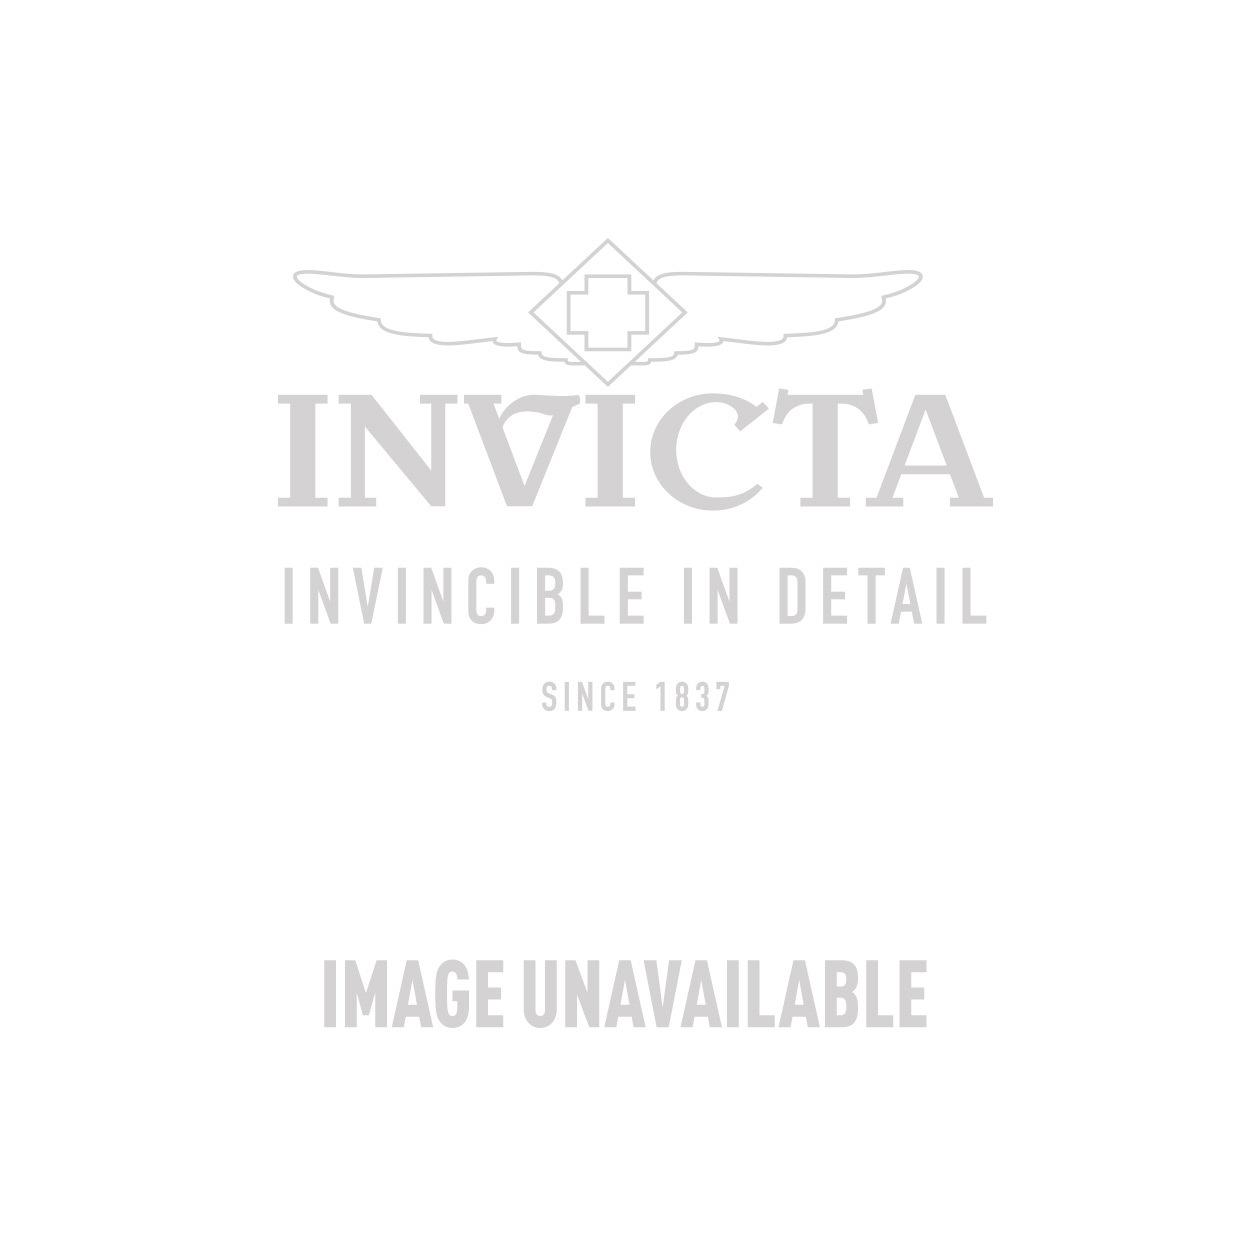 Invicta Specialty Quartz Watch - Gunmetal, Stainless Steel case with Gunmetal tone Stainless Steel band - Model 15164